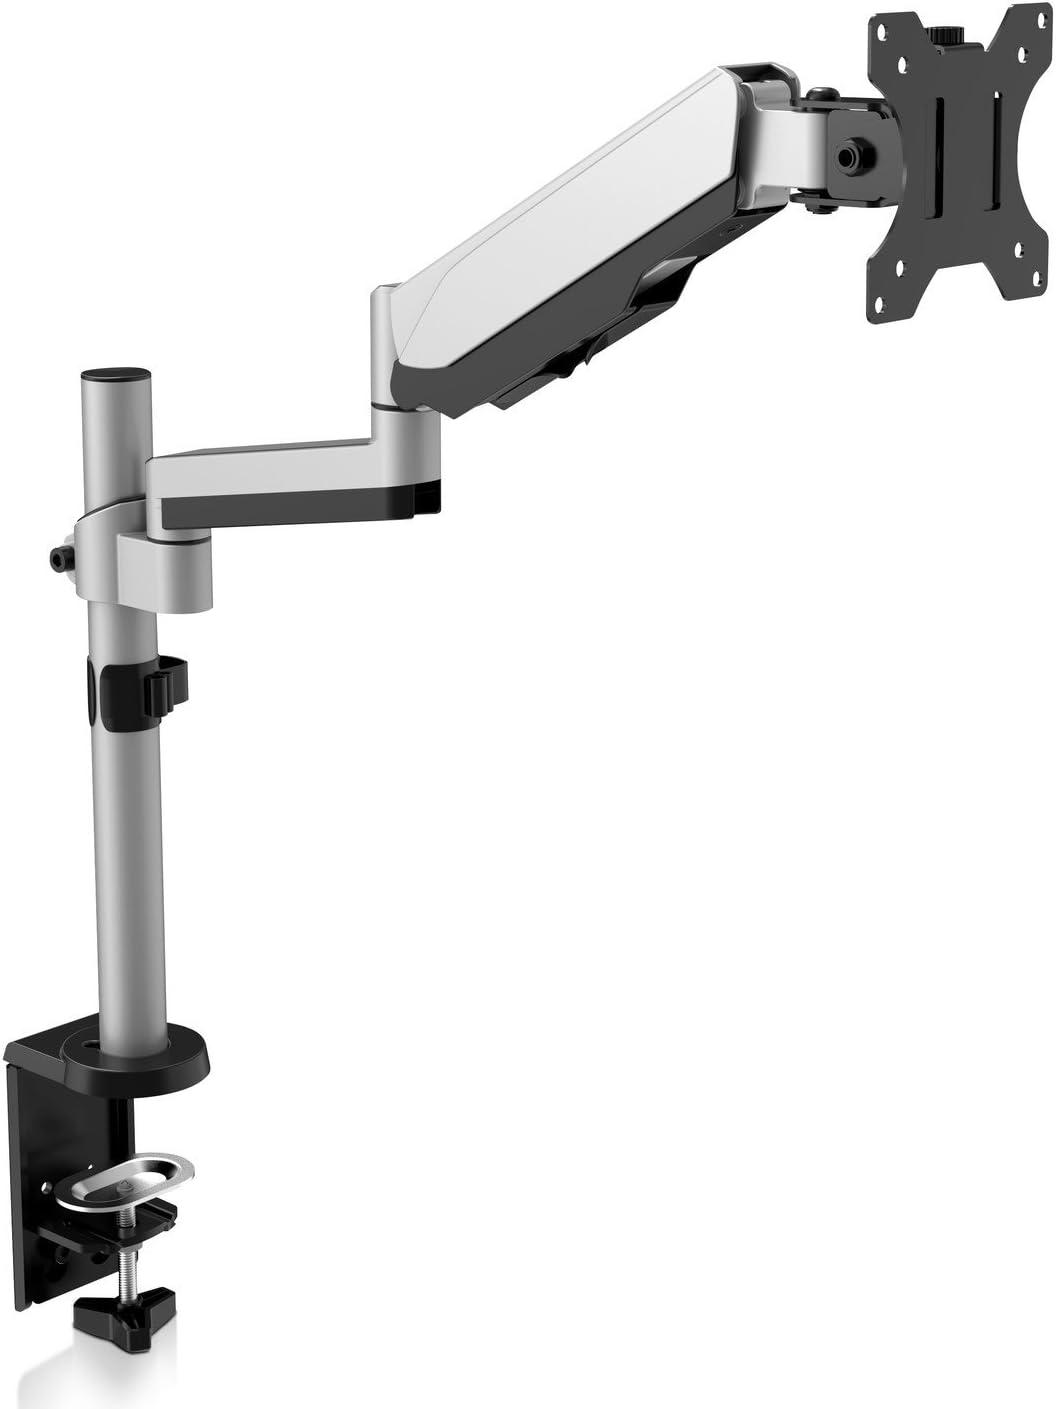 V7 DM1TA-1N -1E Touch Adjust VESA Monitor Max 61% OFF Mount 100x100 Max 71% OFF 75x75